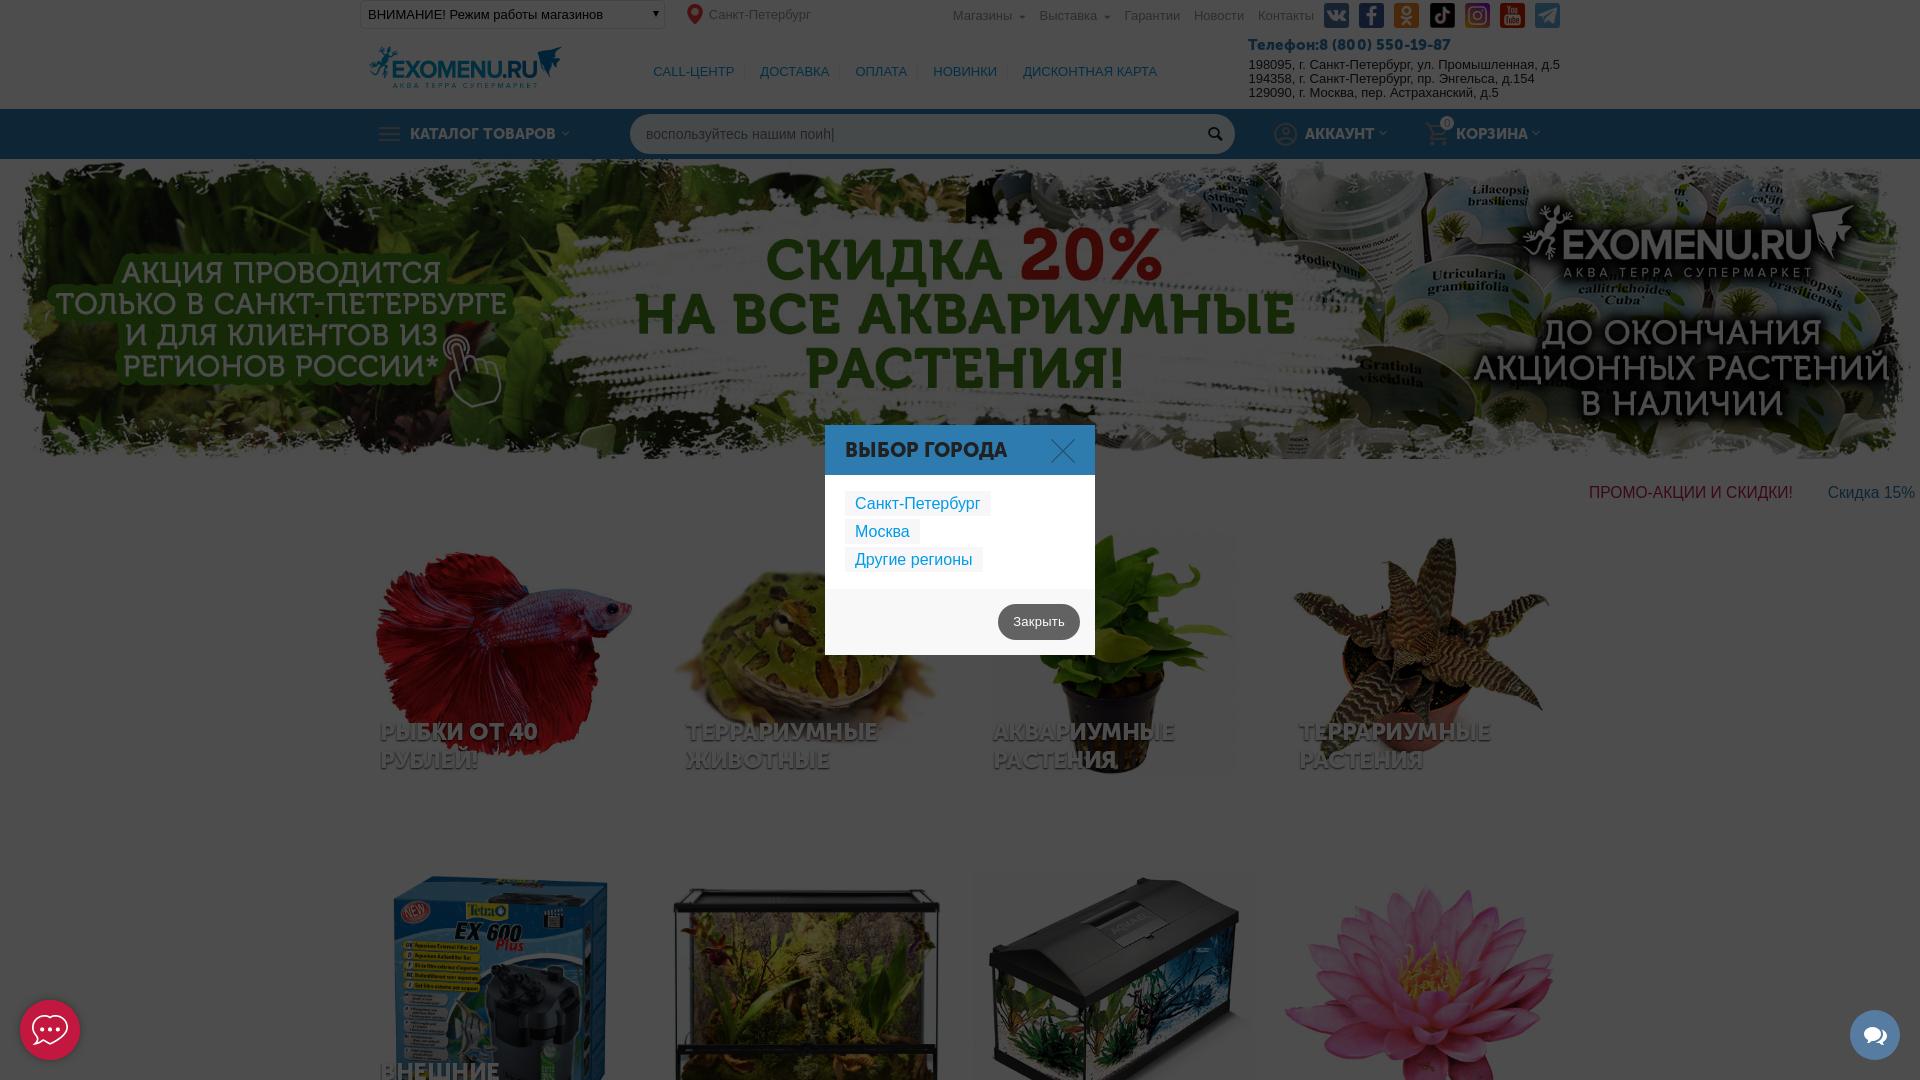 Exomenu.ru website